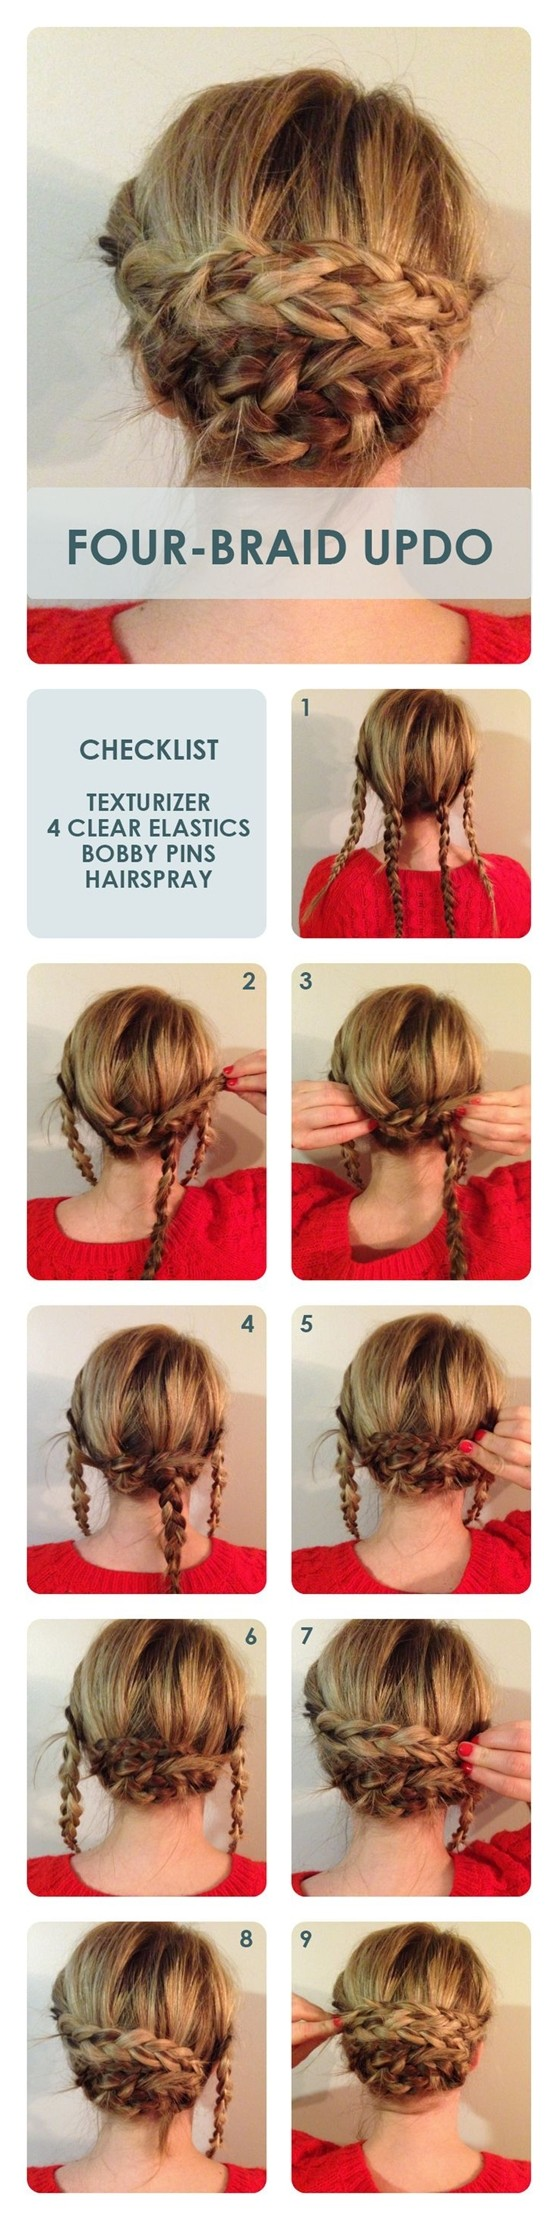 Four Braid Bun Updos: Updo Hairstyle Tutorial